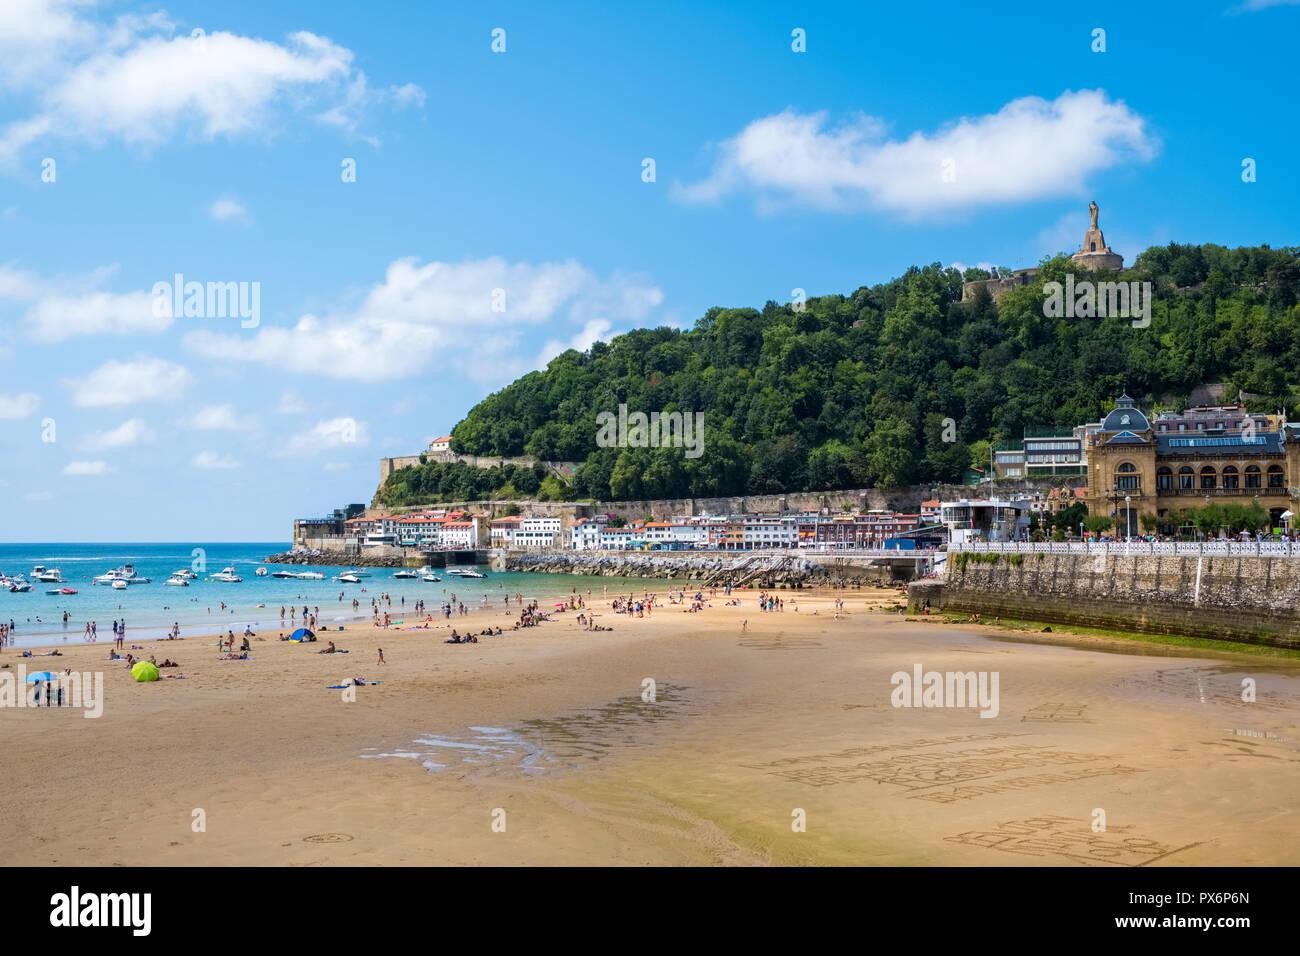 La Concha Bay, San Sebastian, Donostia, Basque Country, Spain, Europe - Stock Image